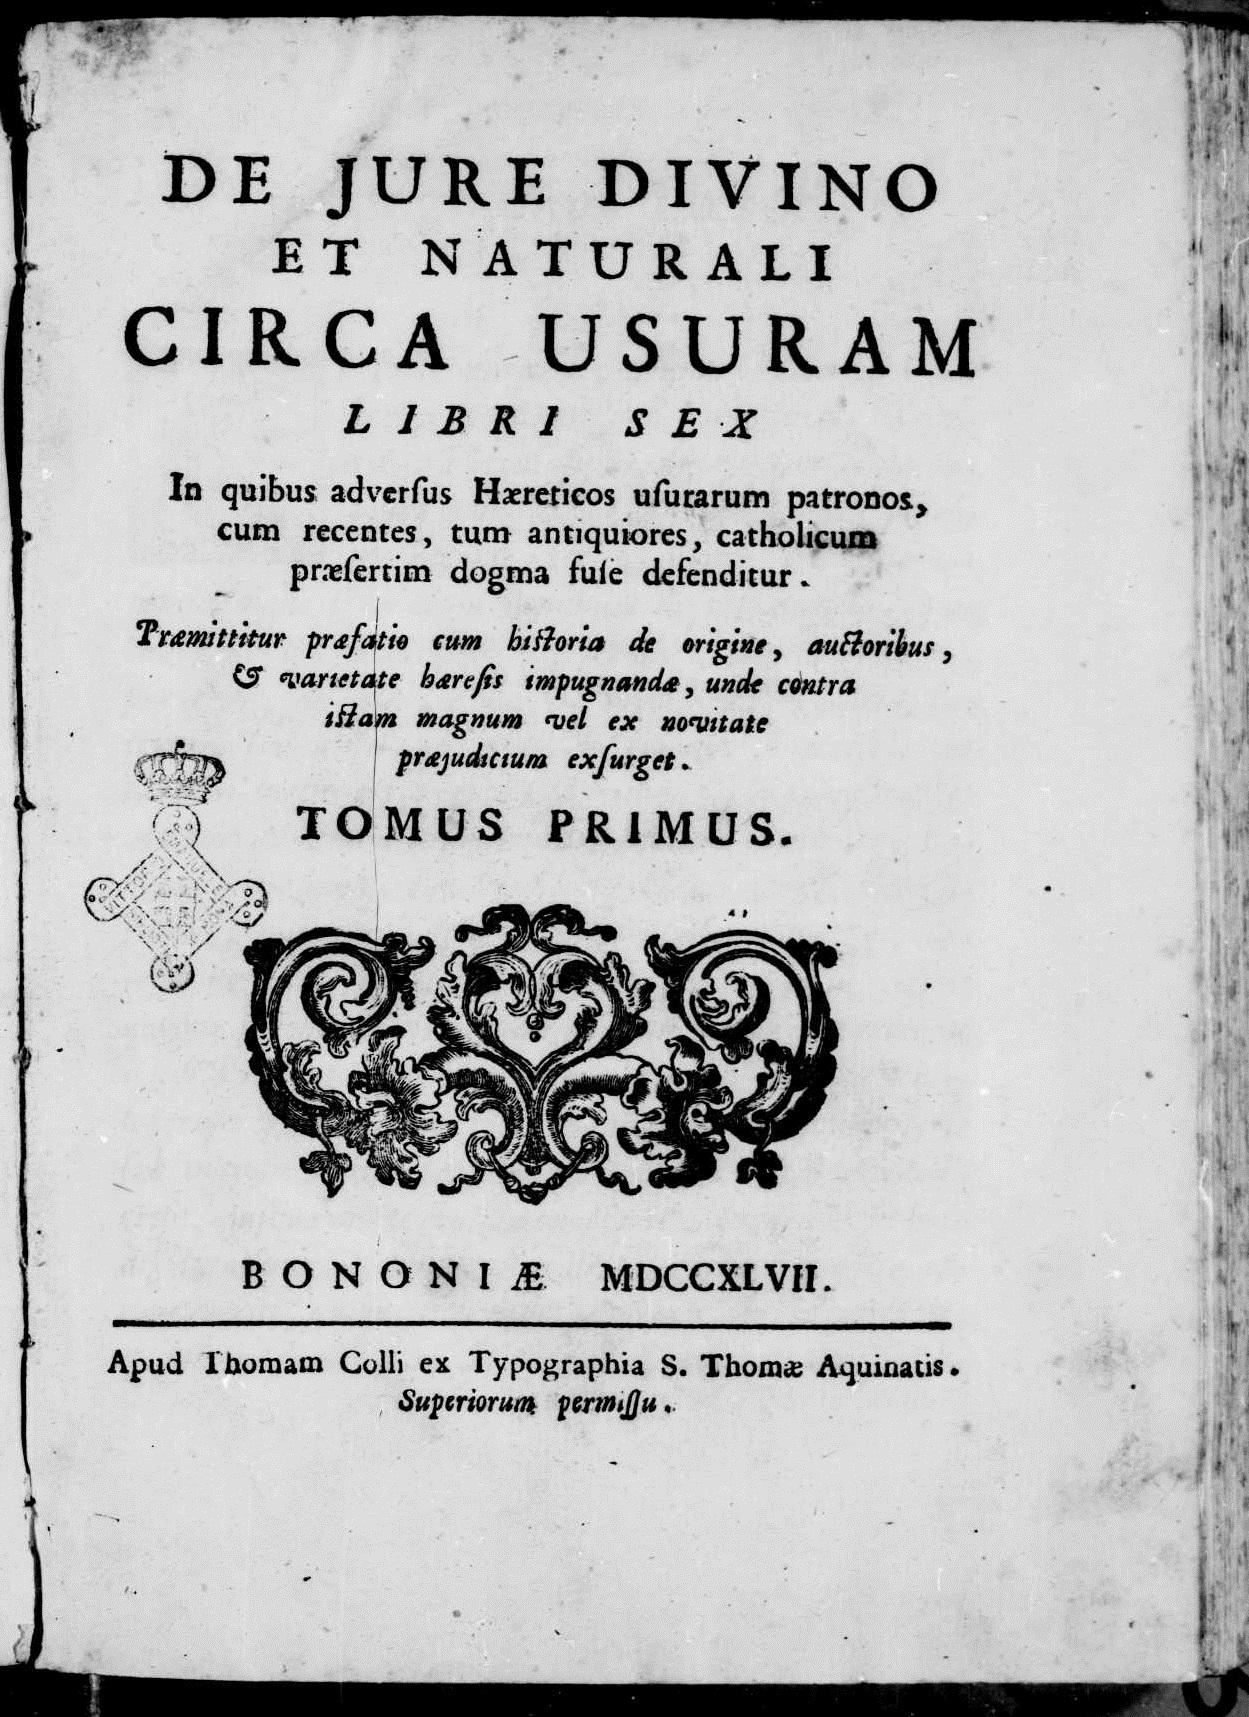 ''De iure divino et naturali circa usuram'', 1747